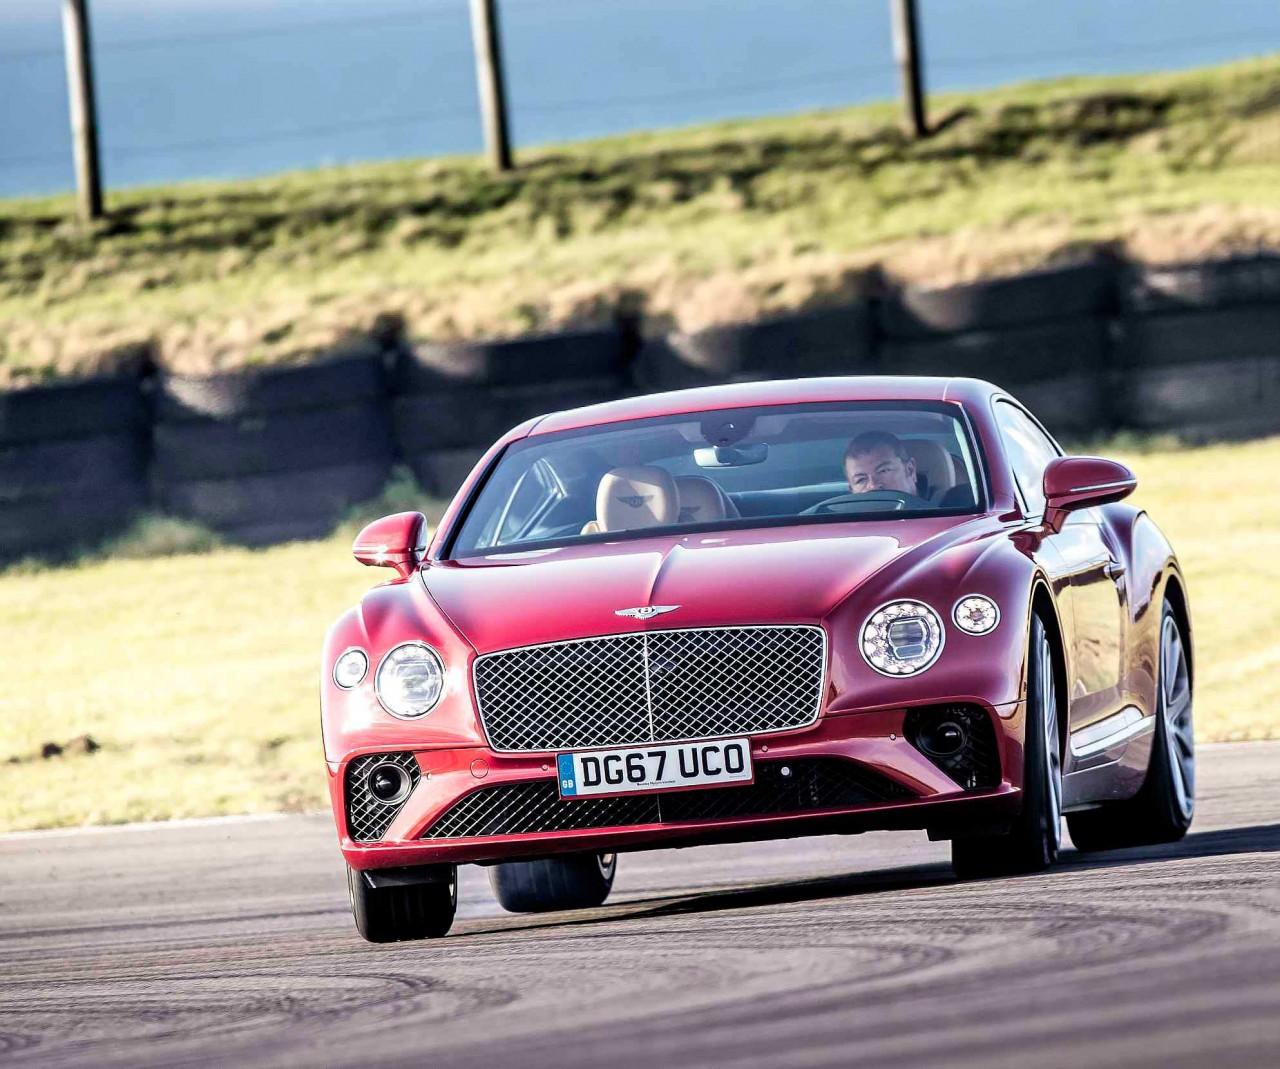 Bentley Price 2015: 2018 Bentley Continental GT First Drive